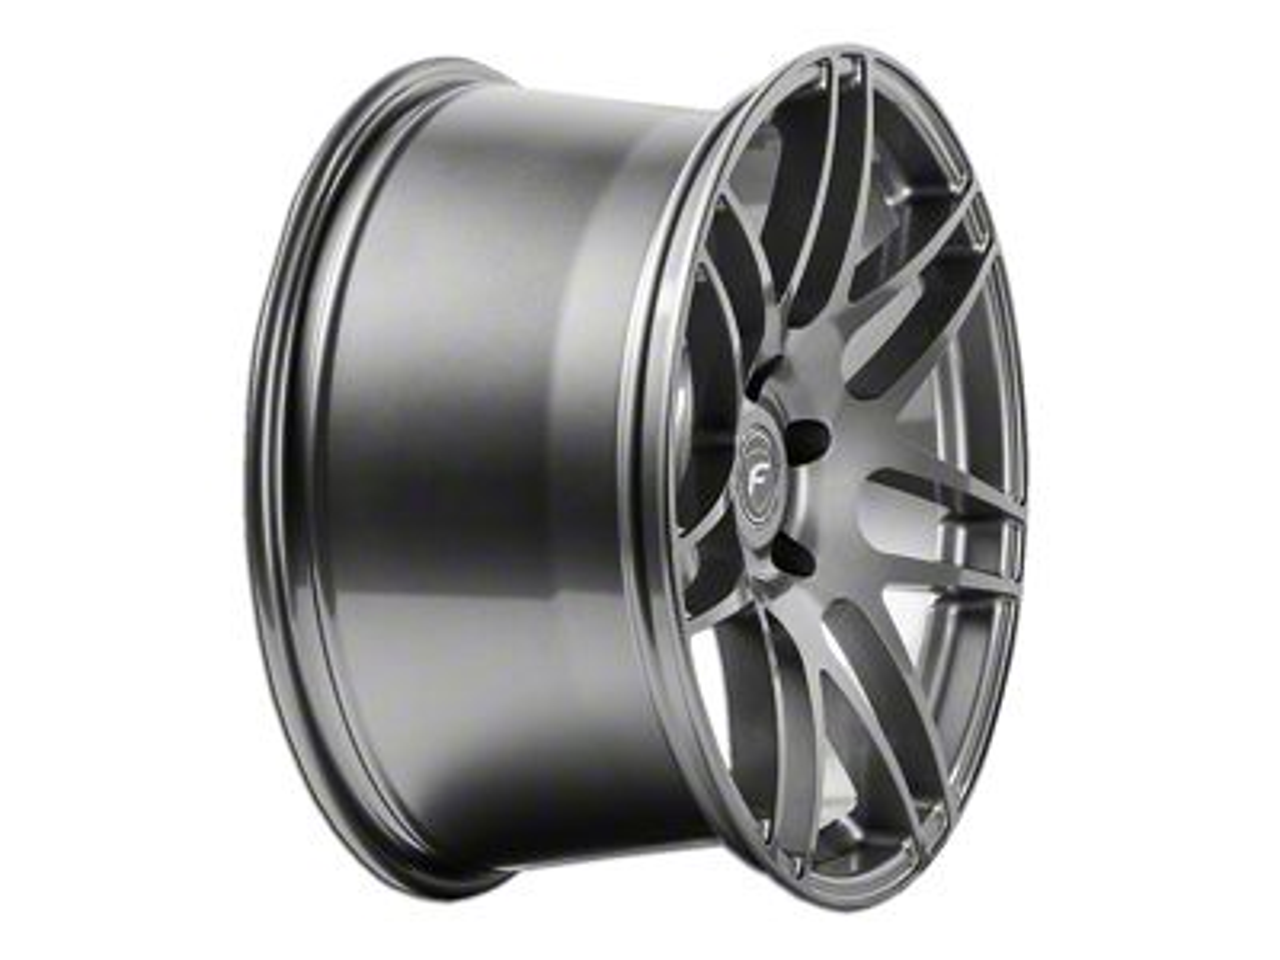 Forgestar F14 Monoblock Deep Concave Monoblock Gunmetal Wheel - 20x11 - Rear Only (15-19 GT, EcoBoost, V6)